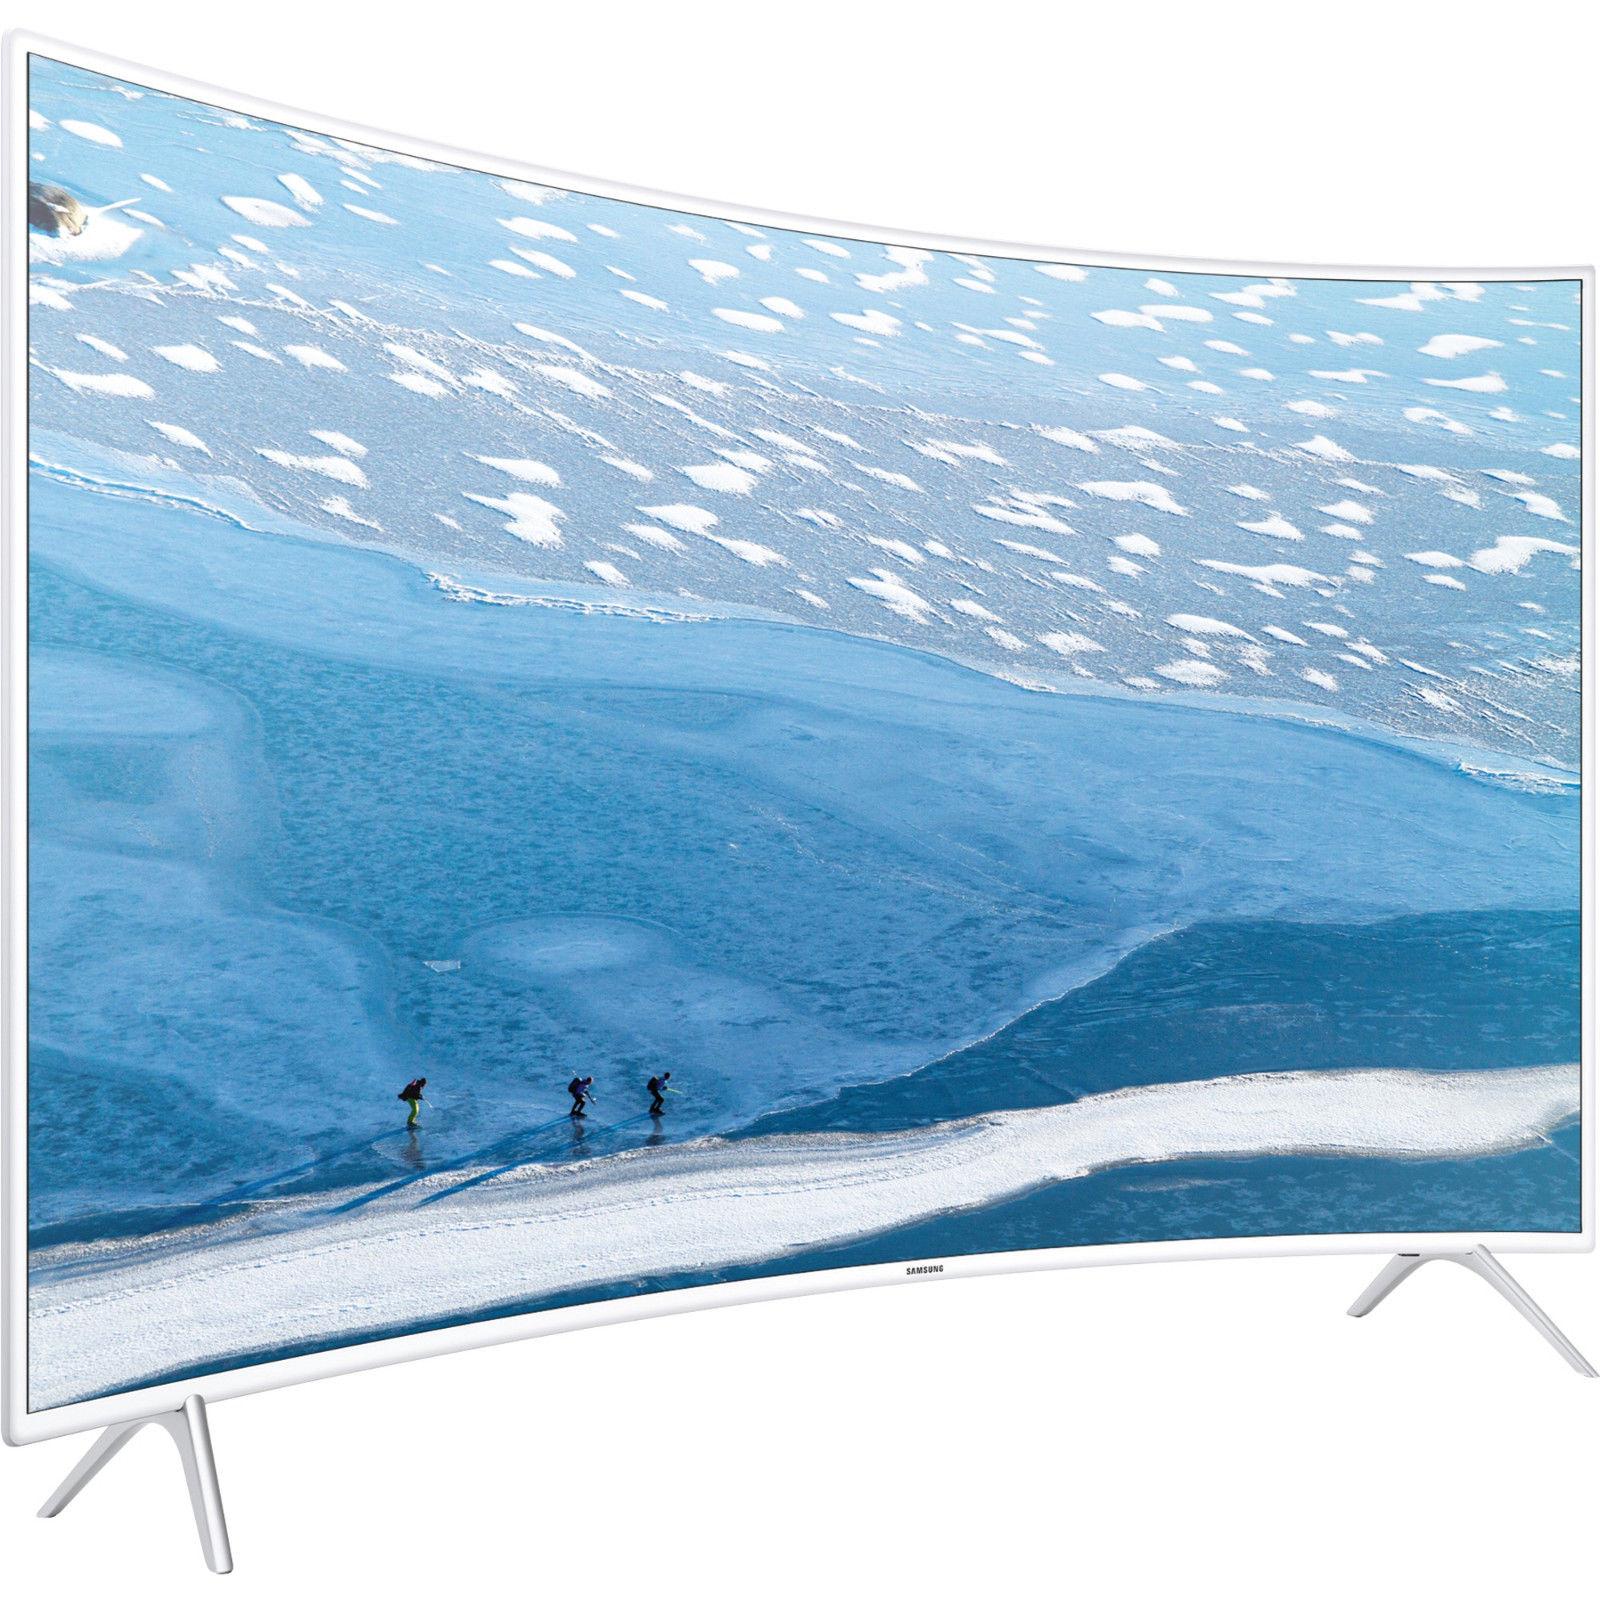 Samsung UE-49KU6510 49 Zoll Curved UHD LED Smart TV Triple Tuner PQI 1600